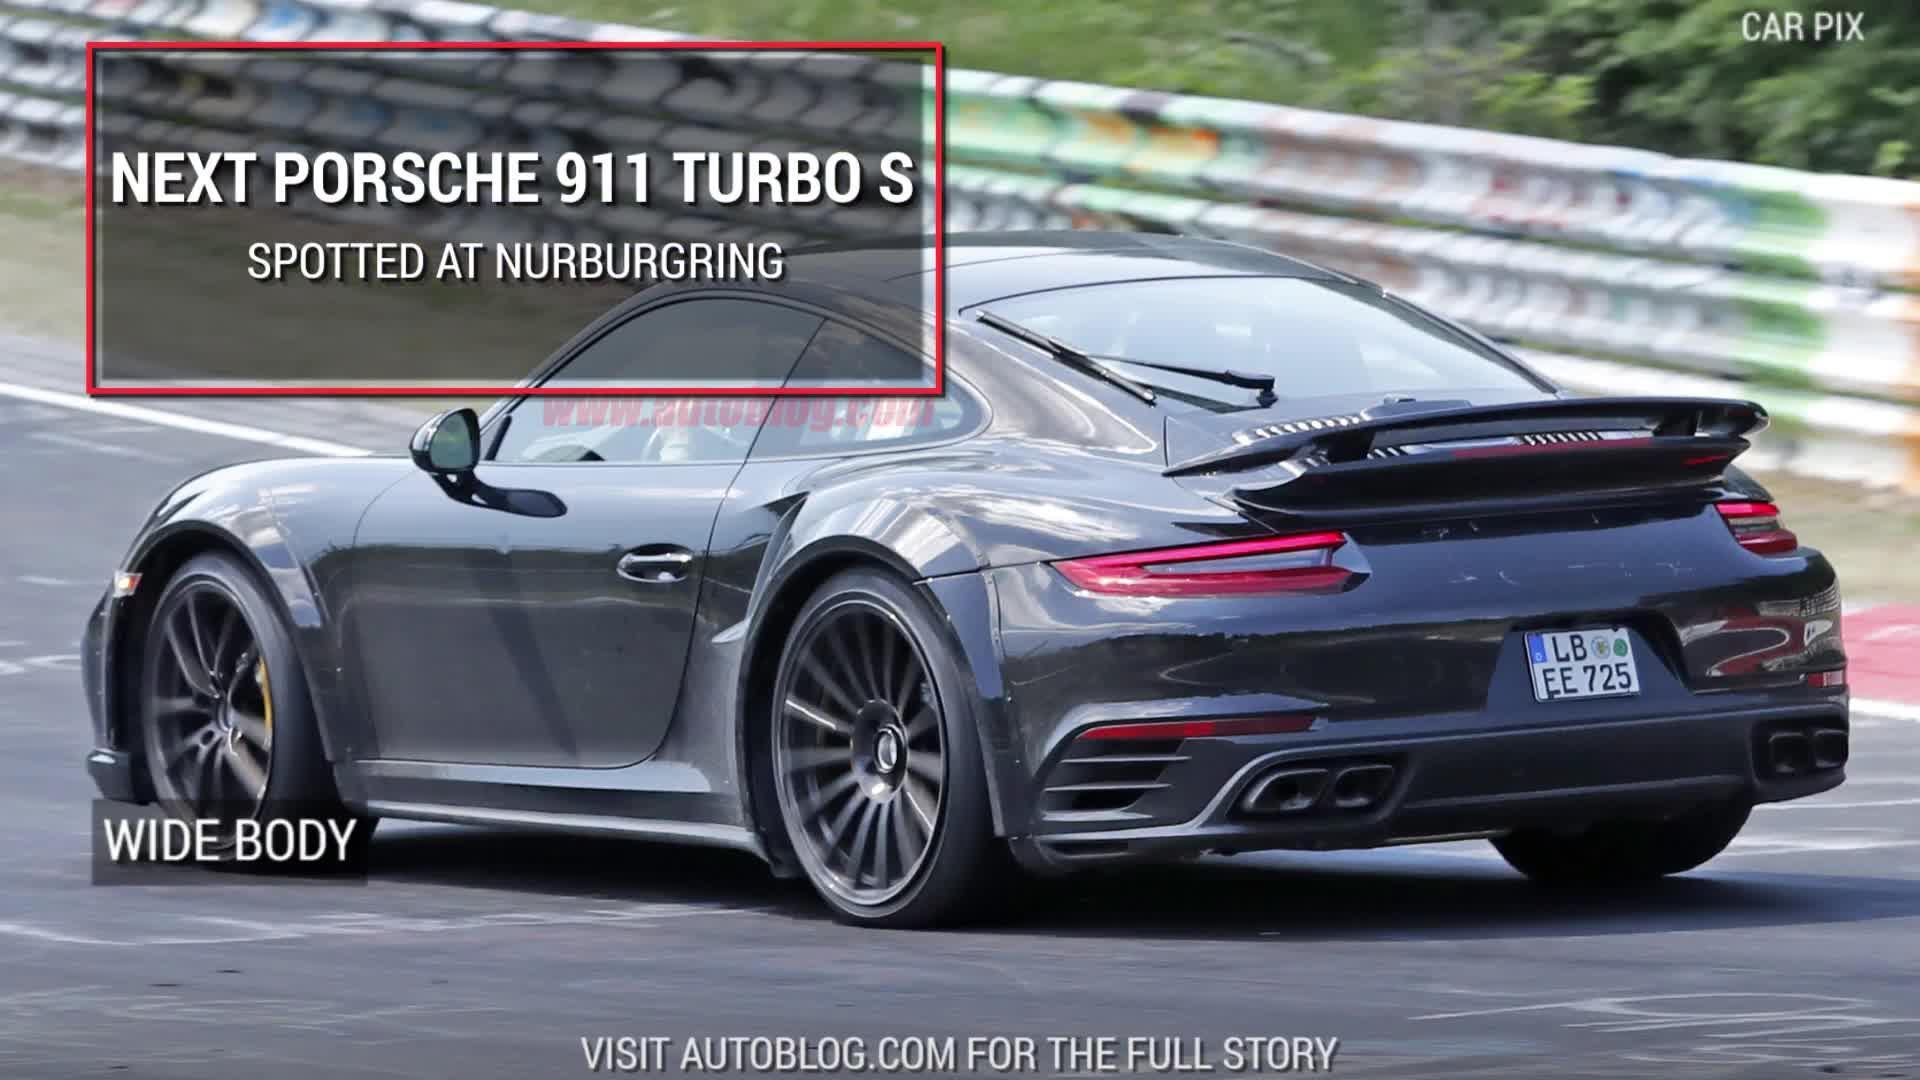 594965f89e6fb34443f38630_o_A_v2 Cozy Porsche 911 Gt2 Rs Nürburgring Cars Trend